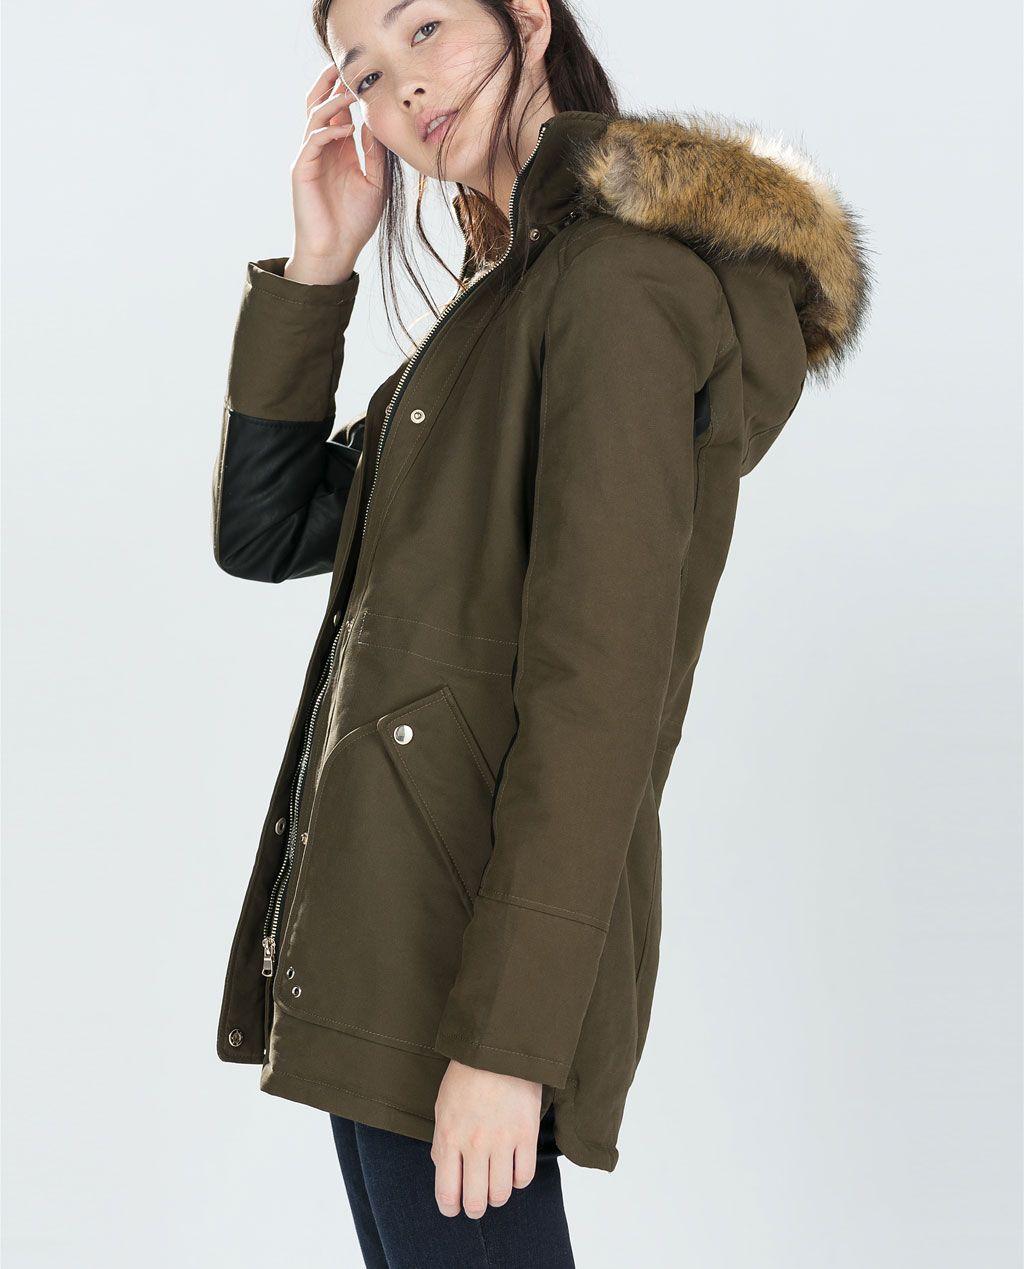 Combined Parka With Fur Hood Trf Outerwear Woman Zara United States Autumn Winter Fashion Fashion Outerwear Women [ 1269 x 1024 Pixel ]